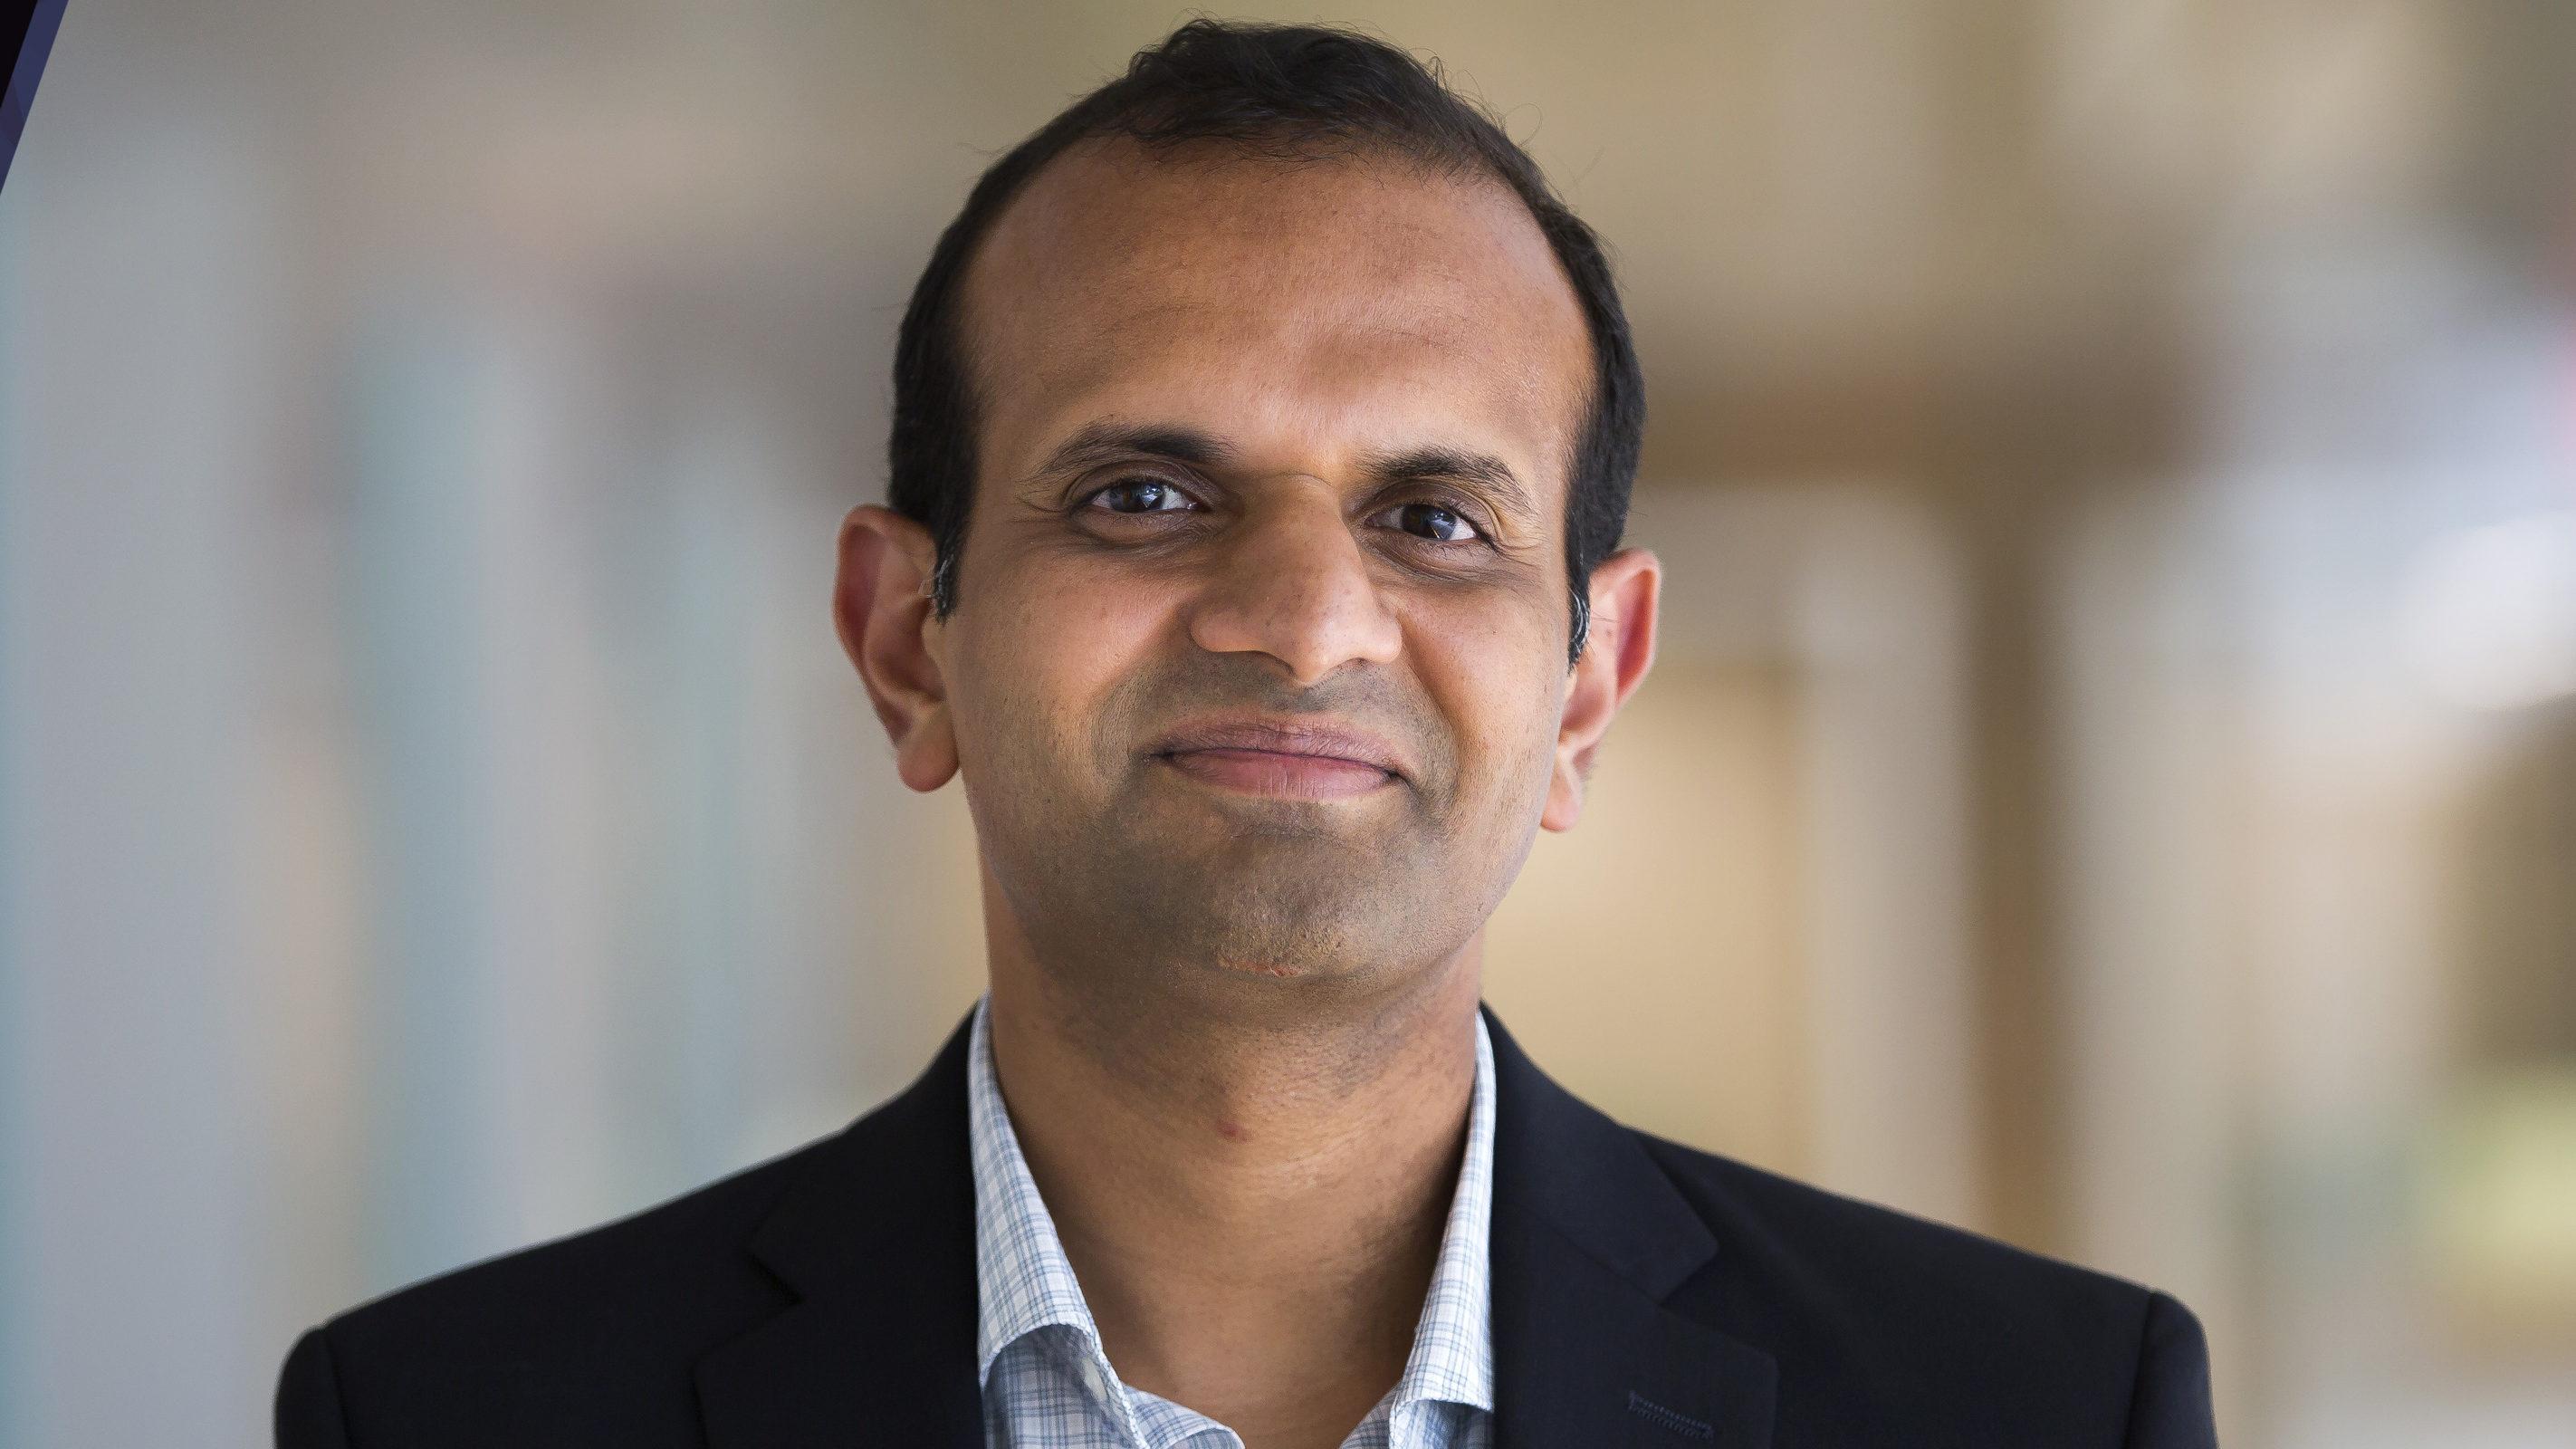 Dr. Venkat Raman on the Rotating Detonation Engine, the frightening-sounding technology of tomorrow